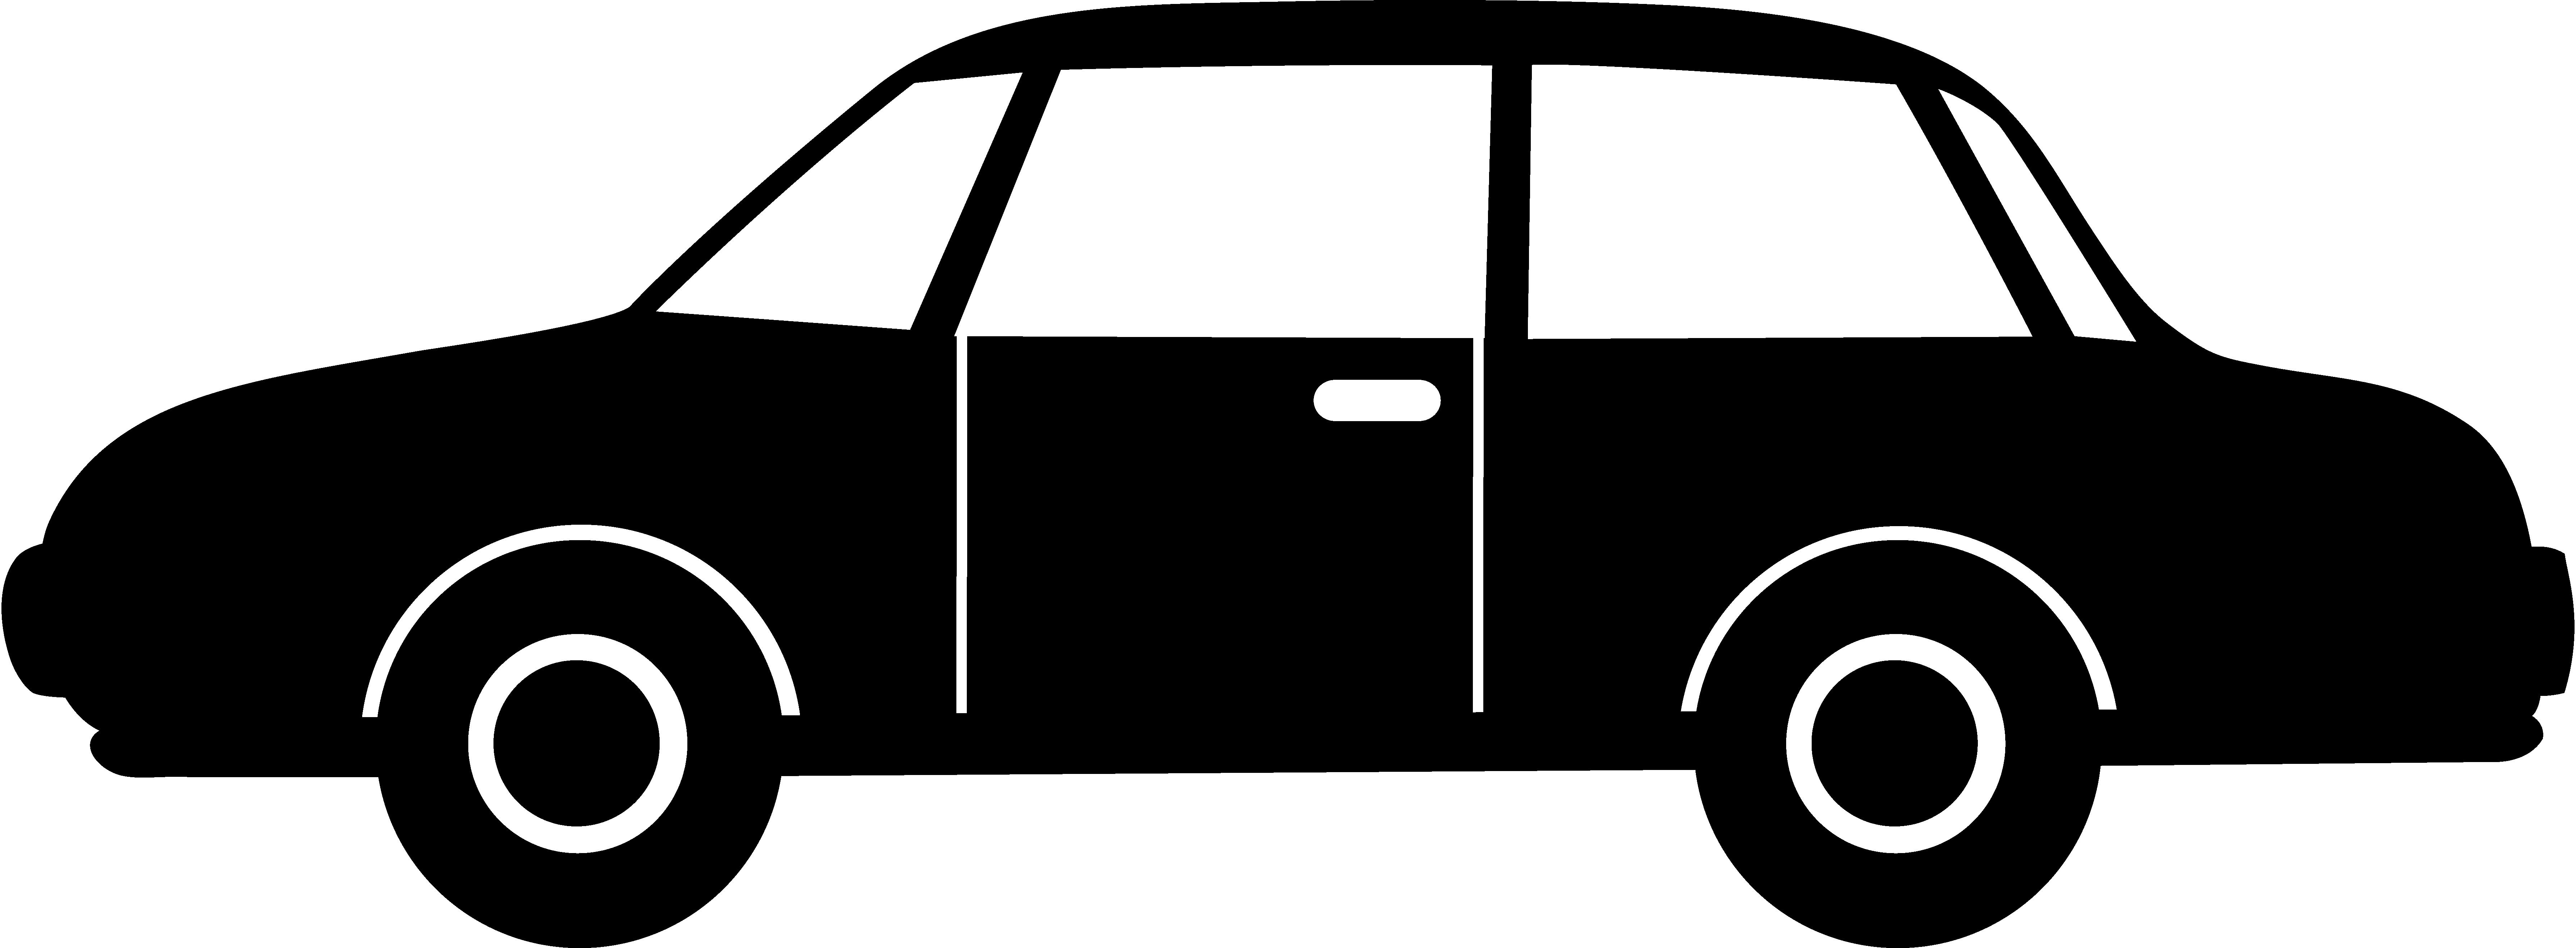 Car clipart #20, Download drawings